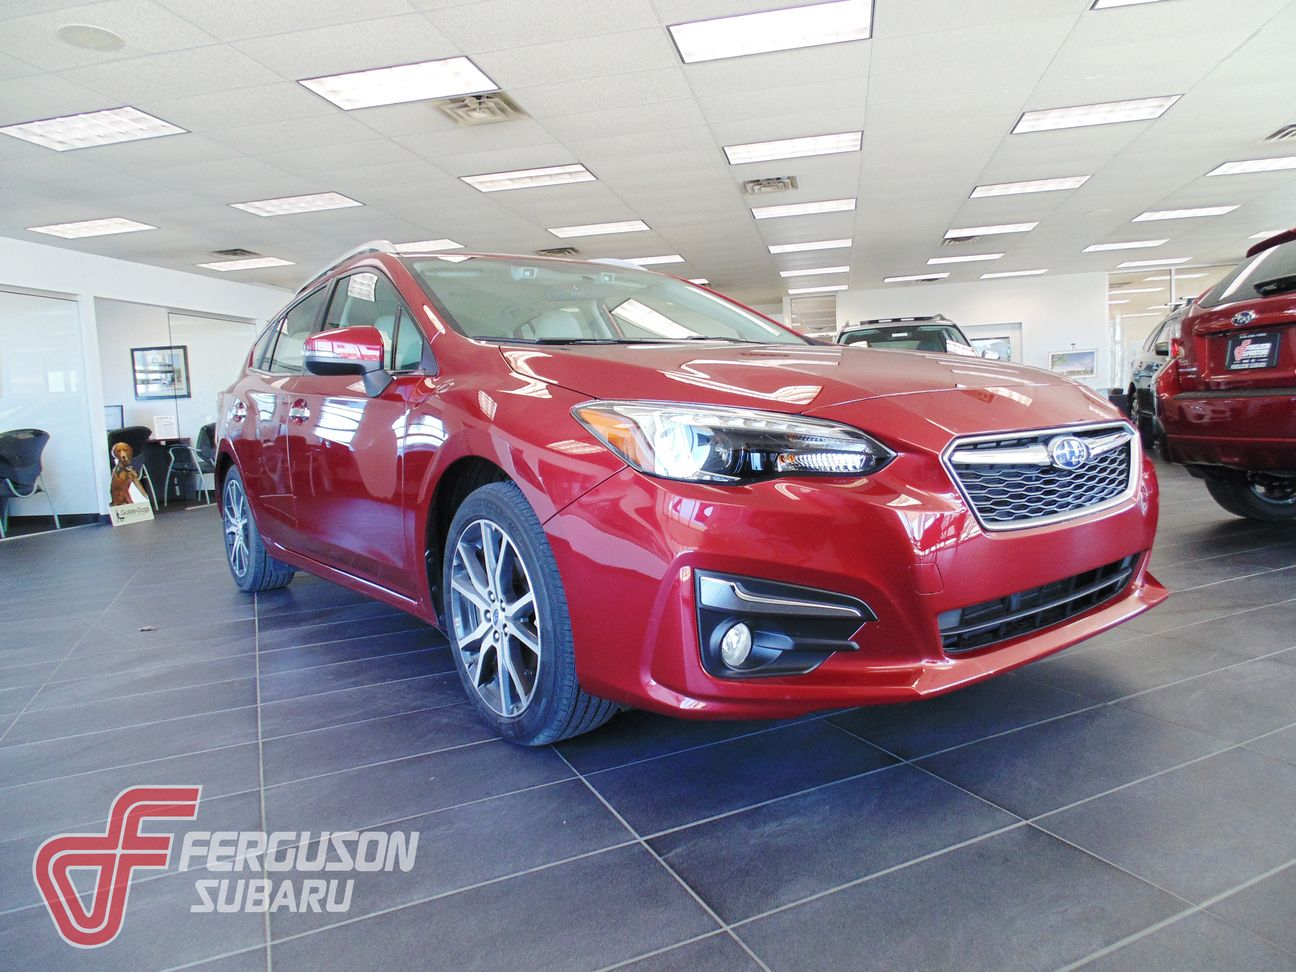 2017 Subaru Impreza Subaru Impreza Subaru Impreza